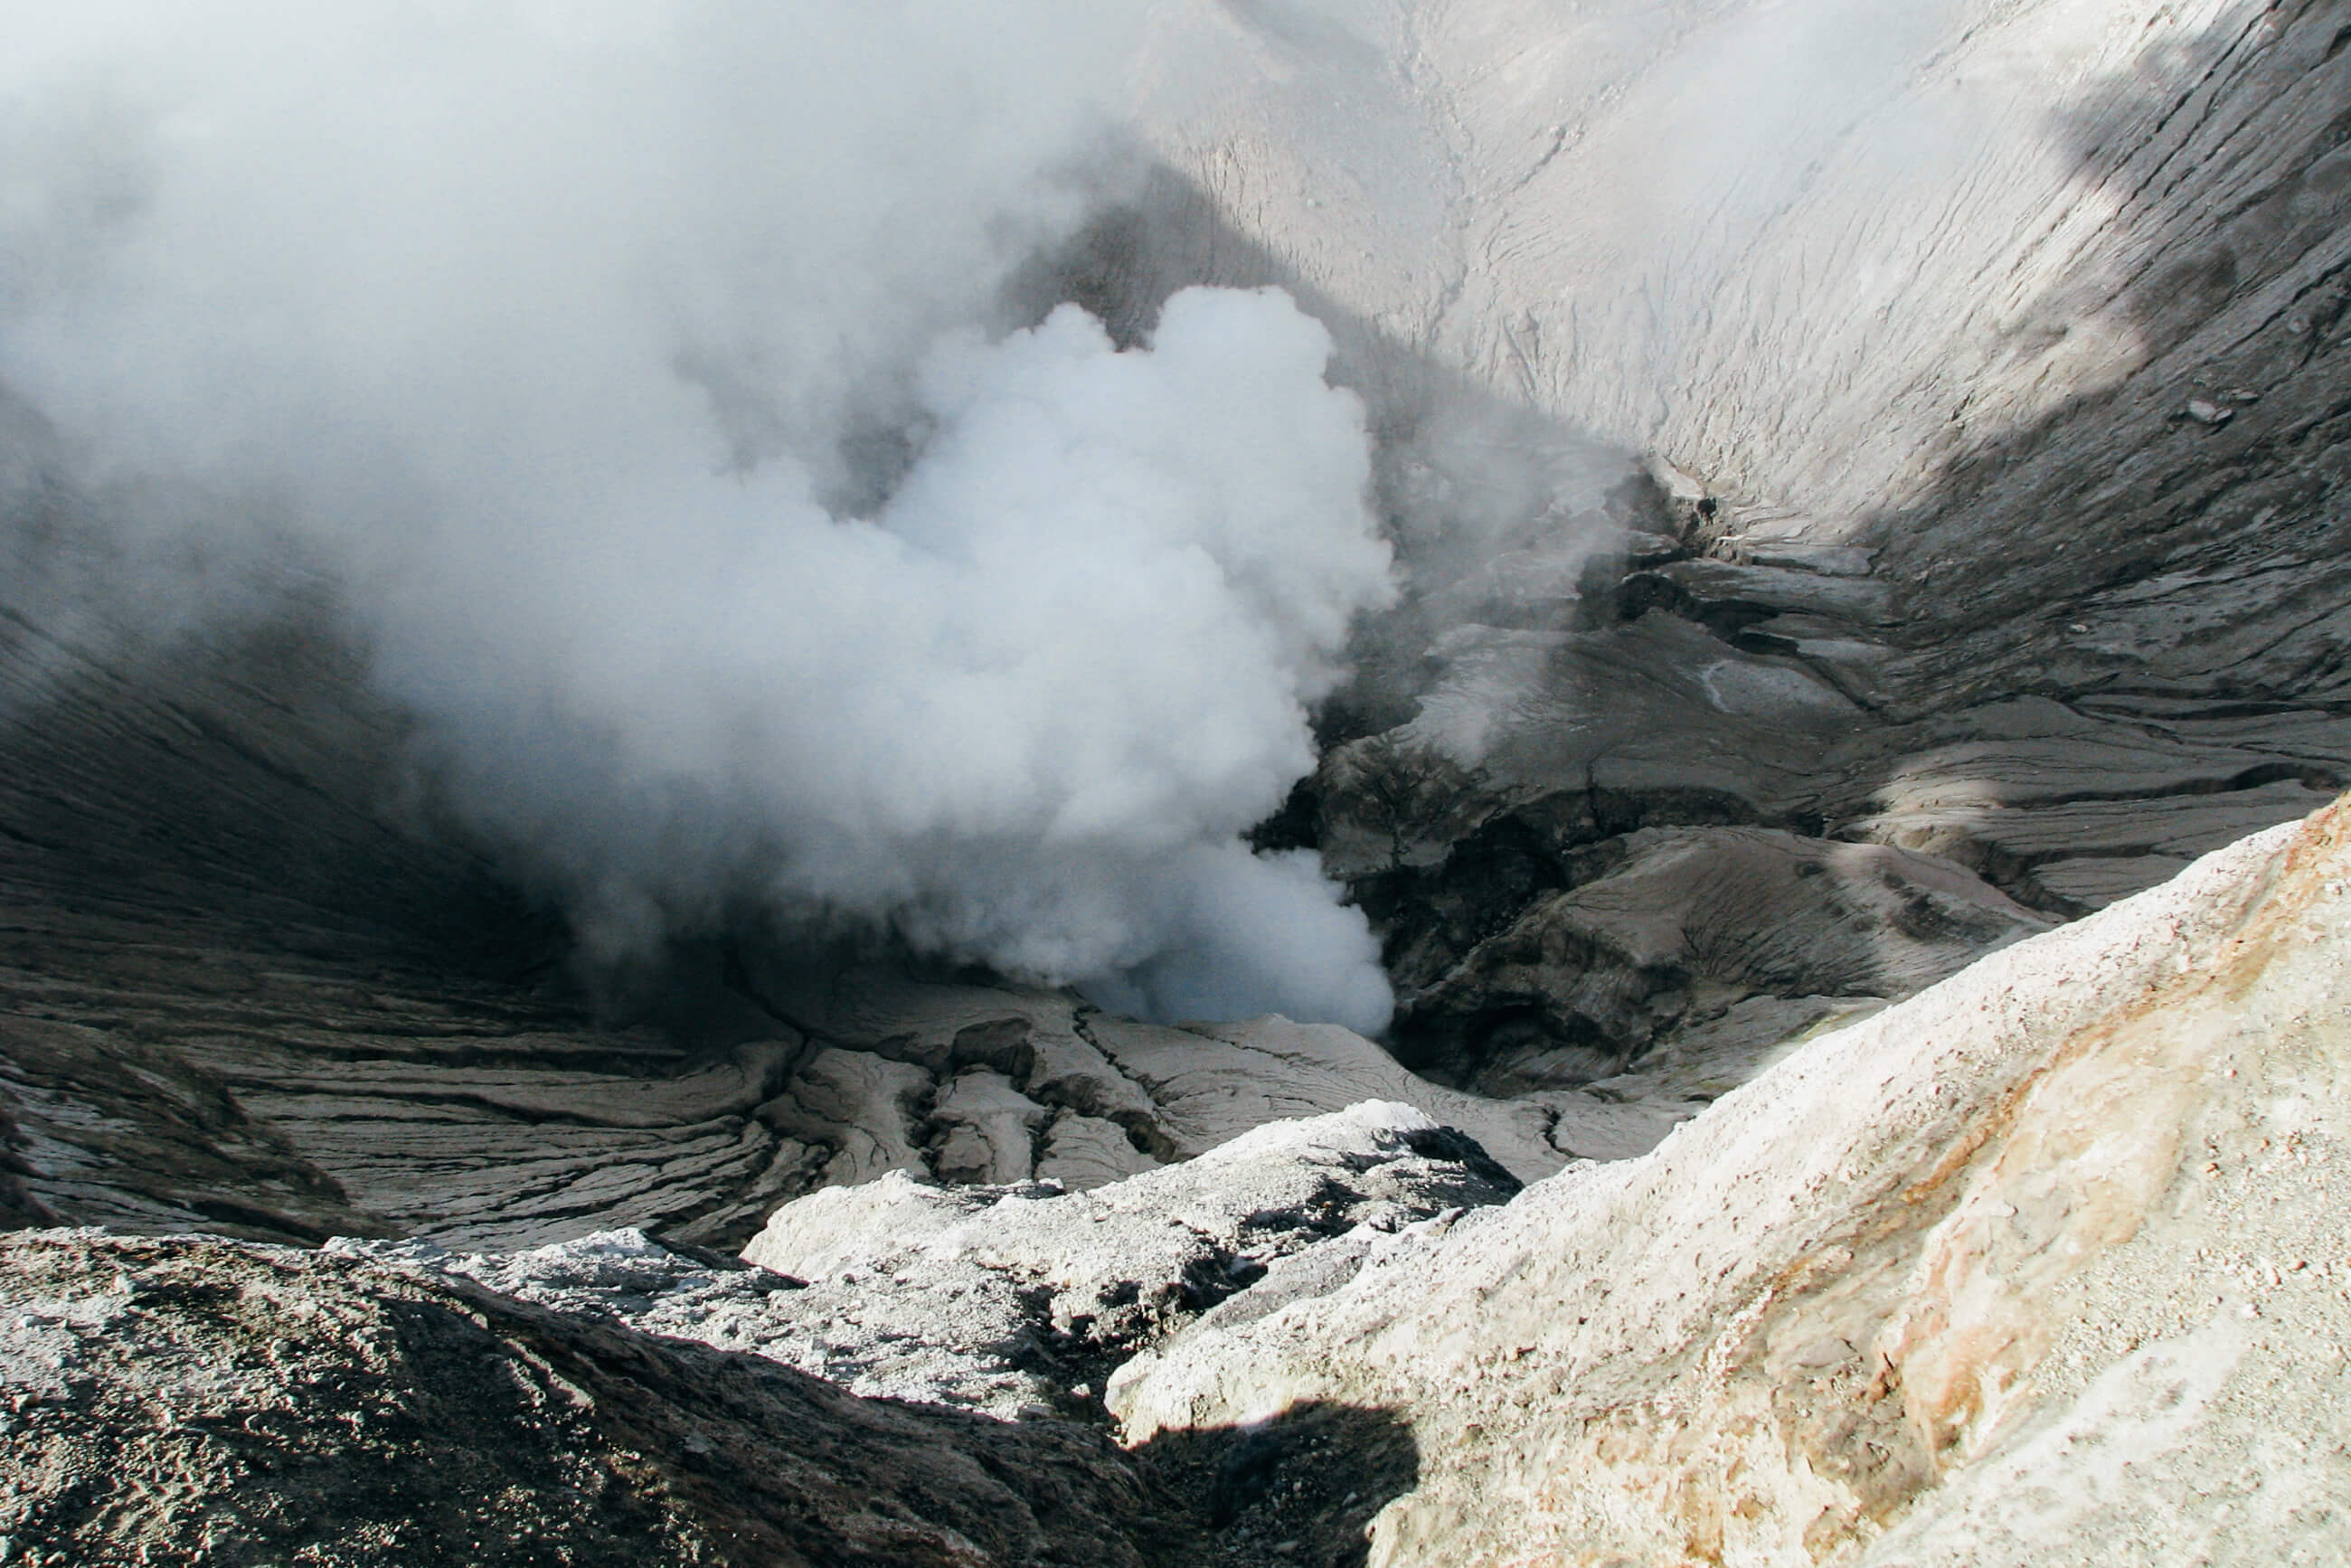 https://bubo.sk/uploads/galleries/7304/jozefharvanek_indonezia_java_297-pohlad-do-kratera-sopky-bromo-22.jpg